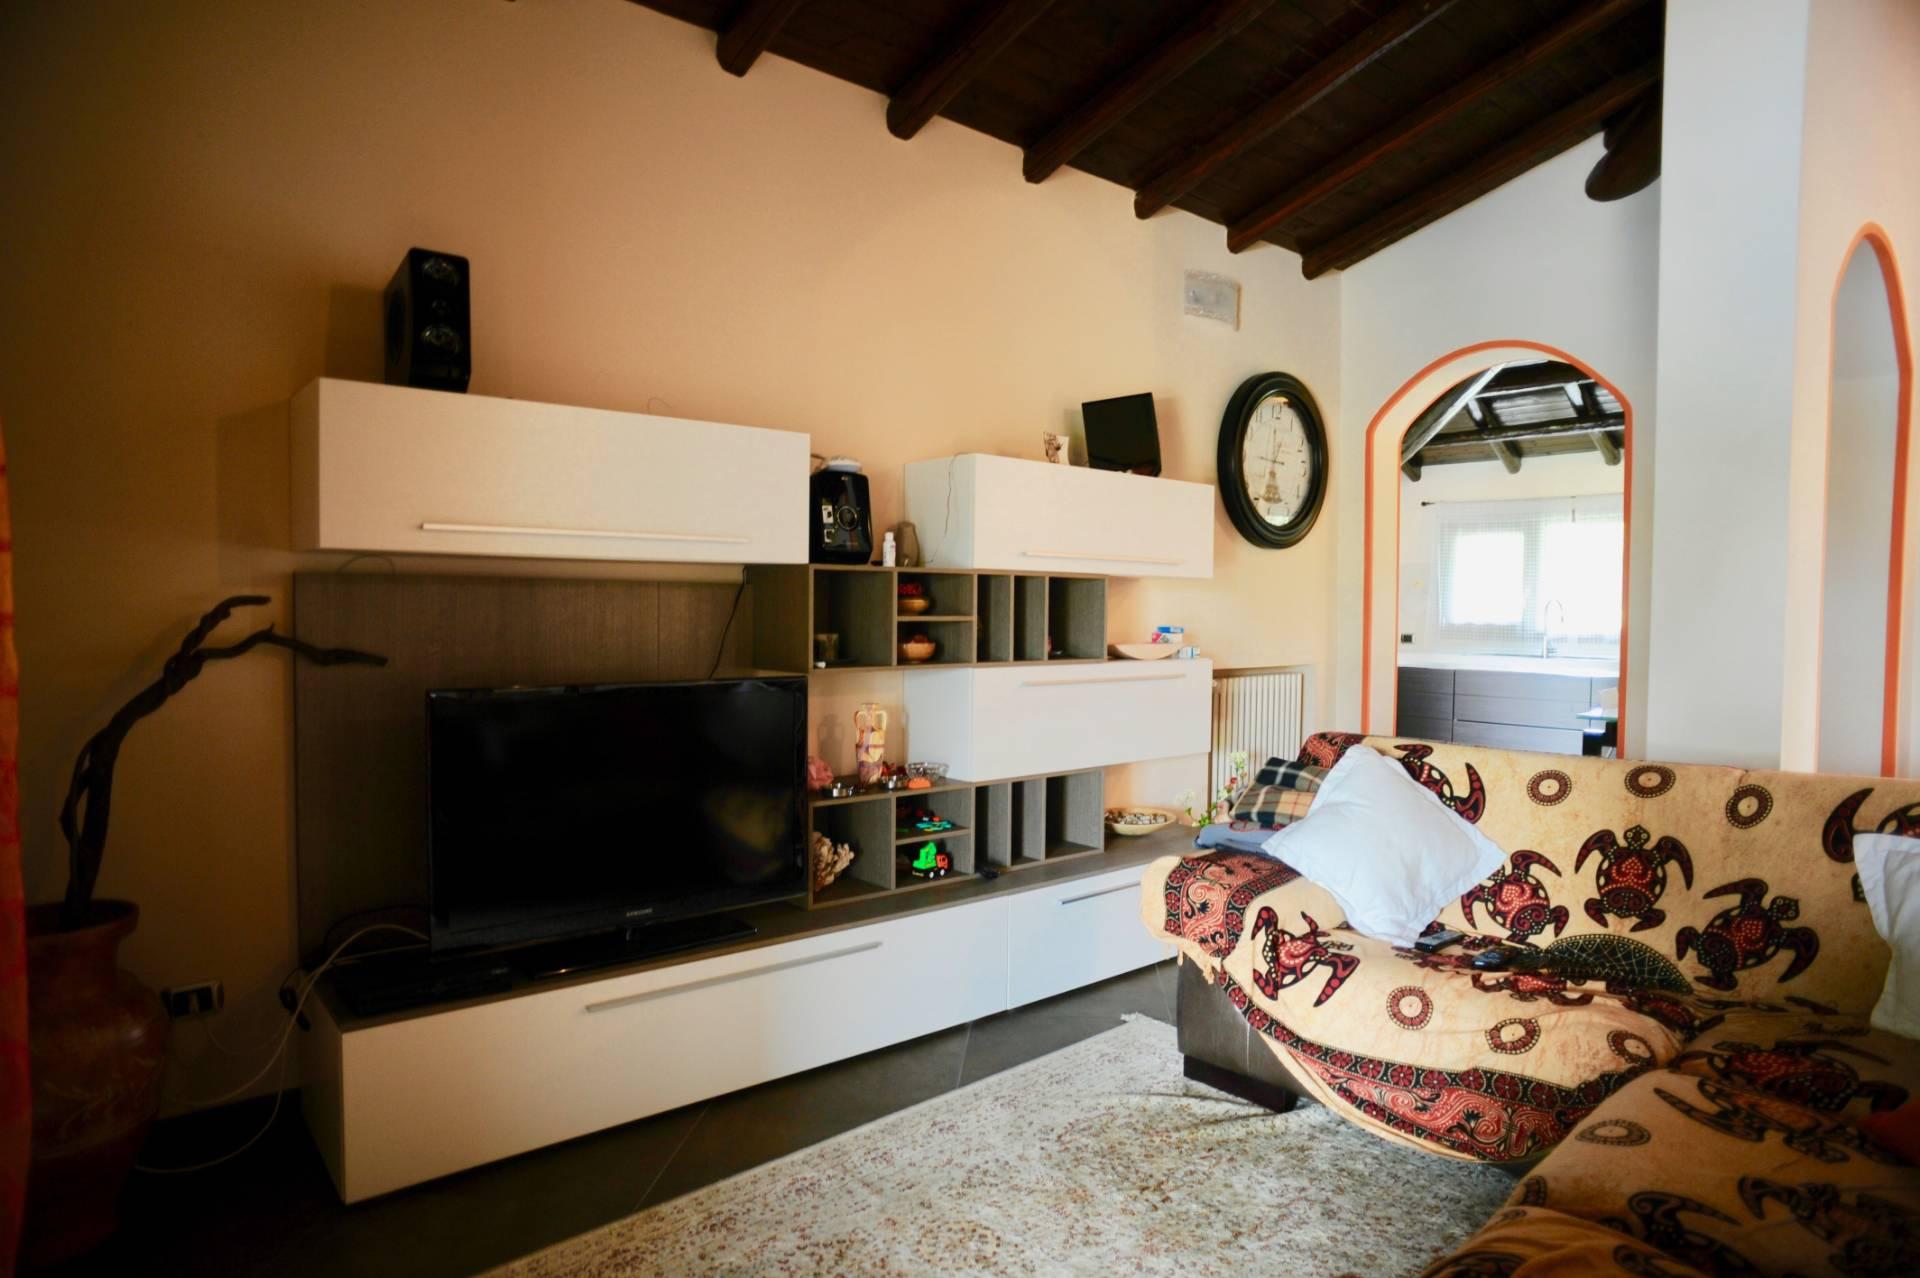 Villa in Vendita a Padenghe Sul Garda: 3 locali, 100 mq - Foto 10